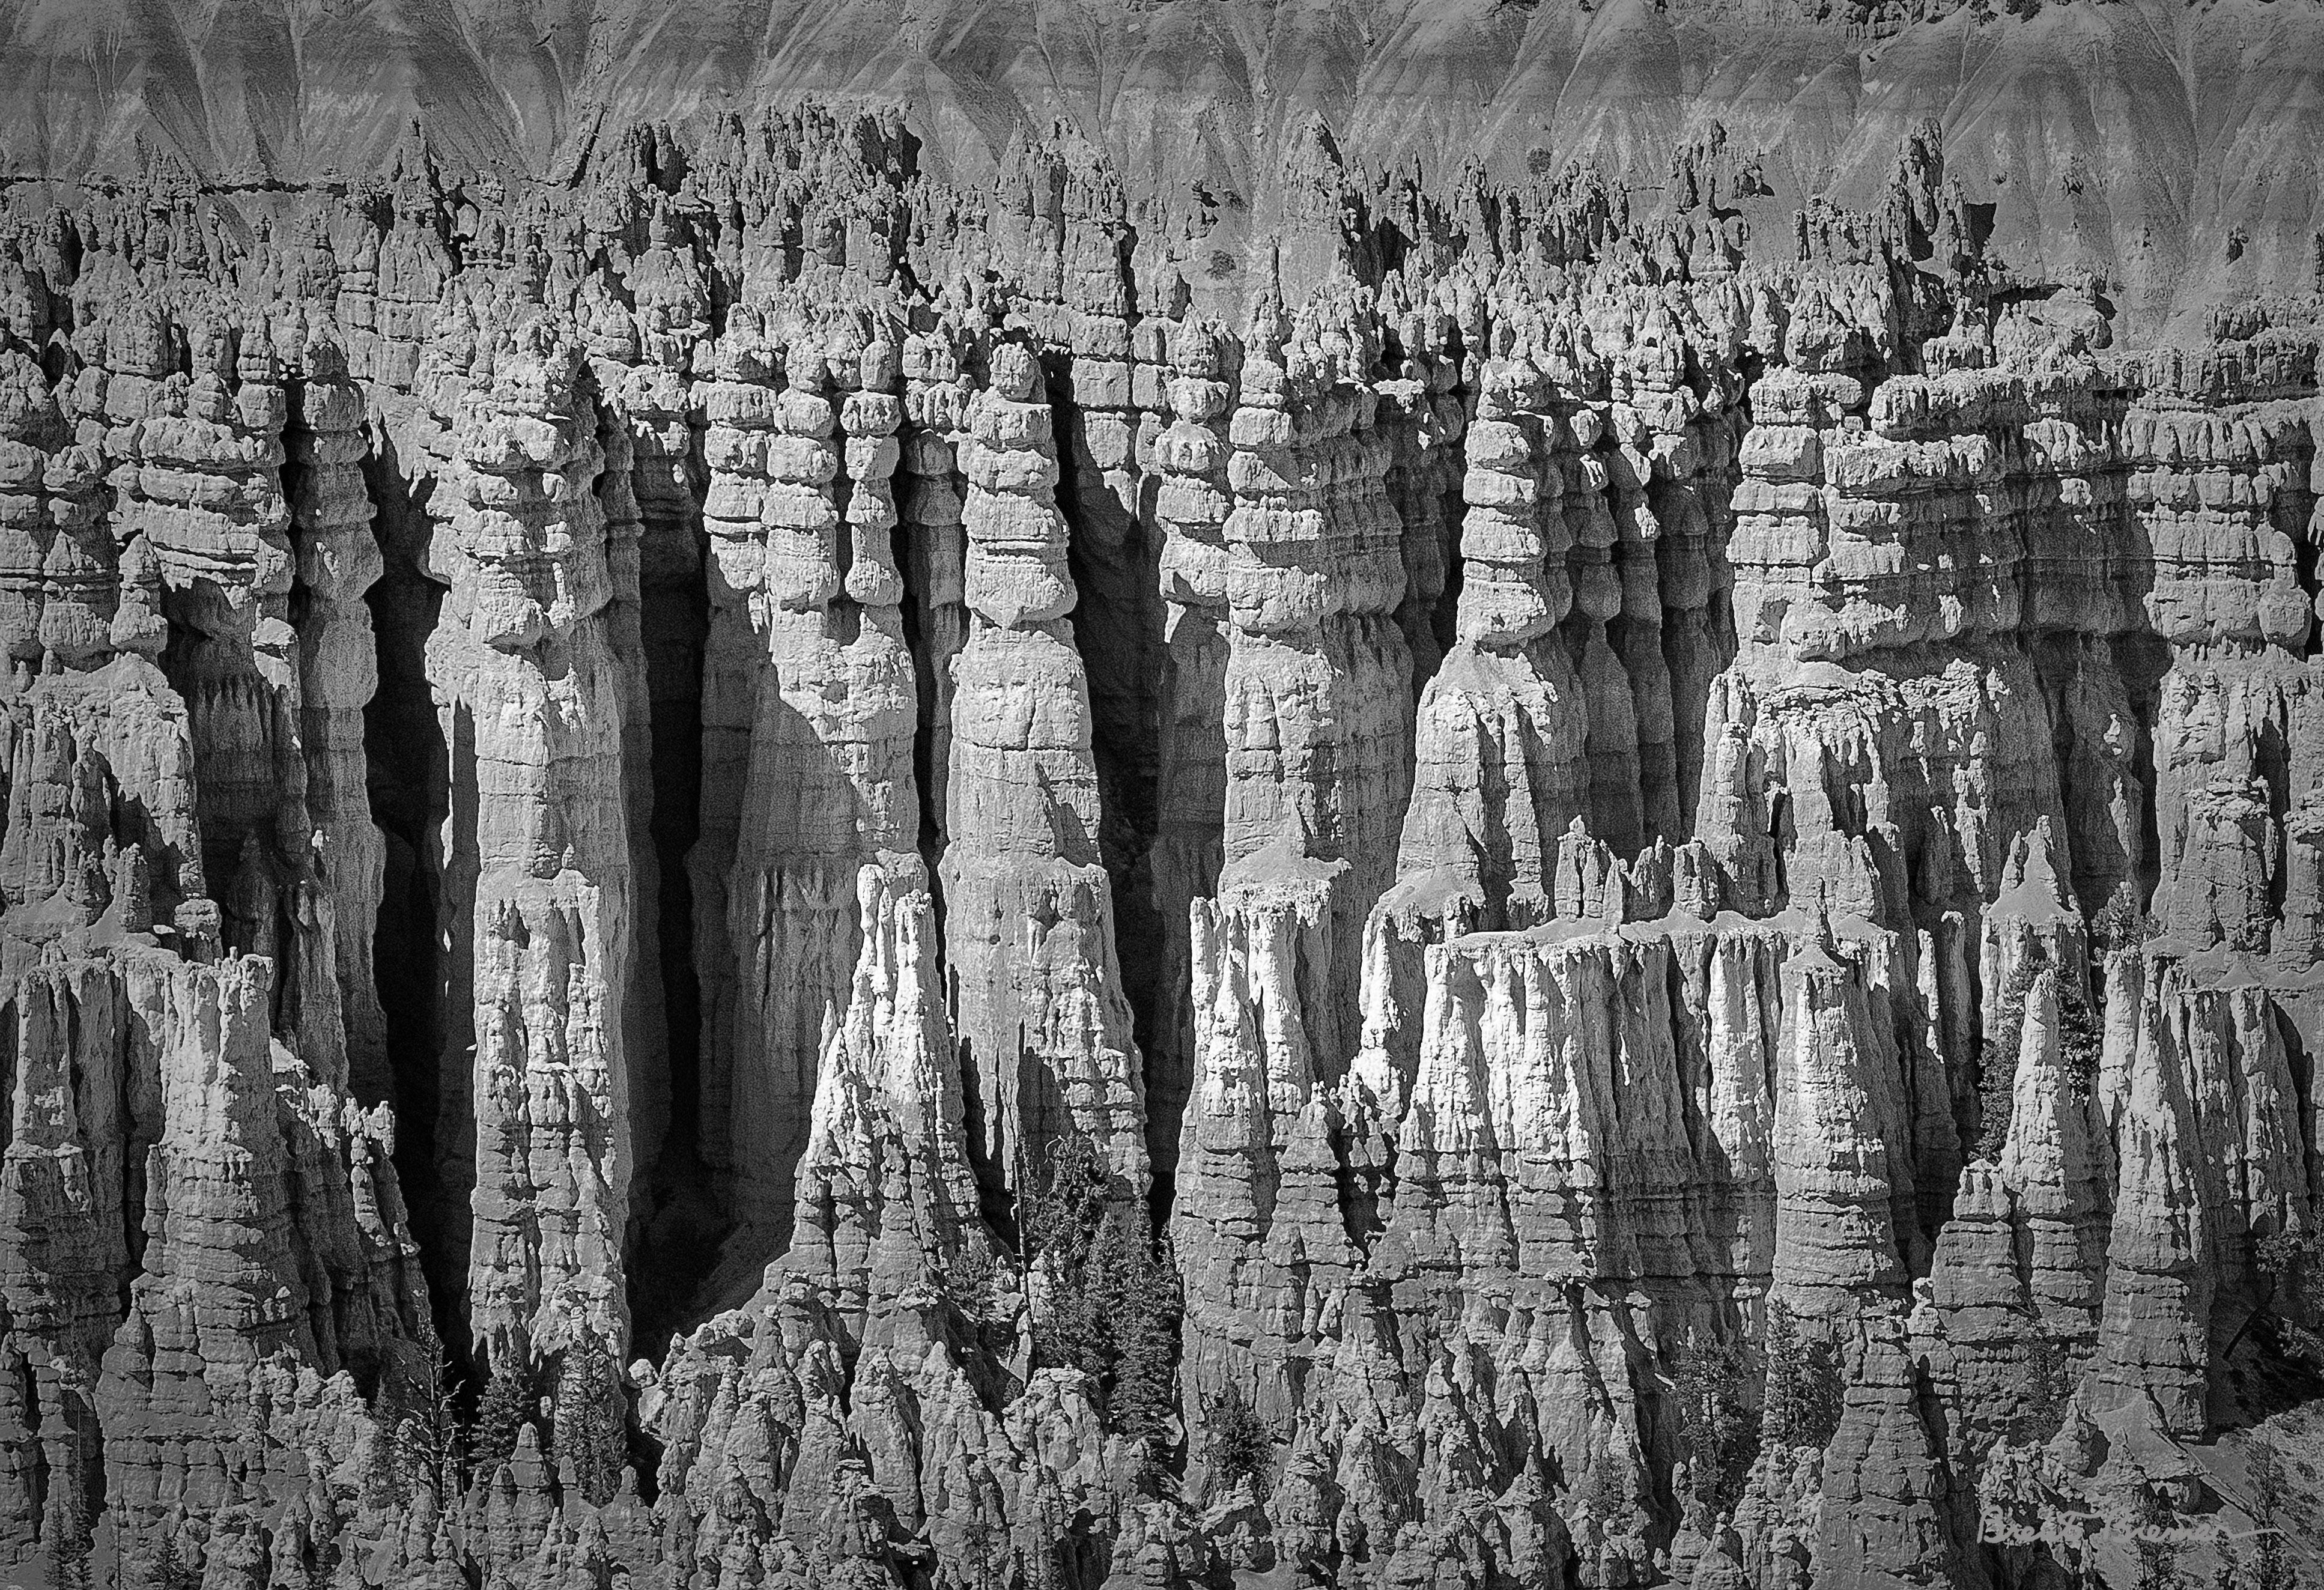 Bryce Canyon Hoodoos - Brent Bremer